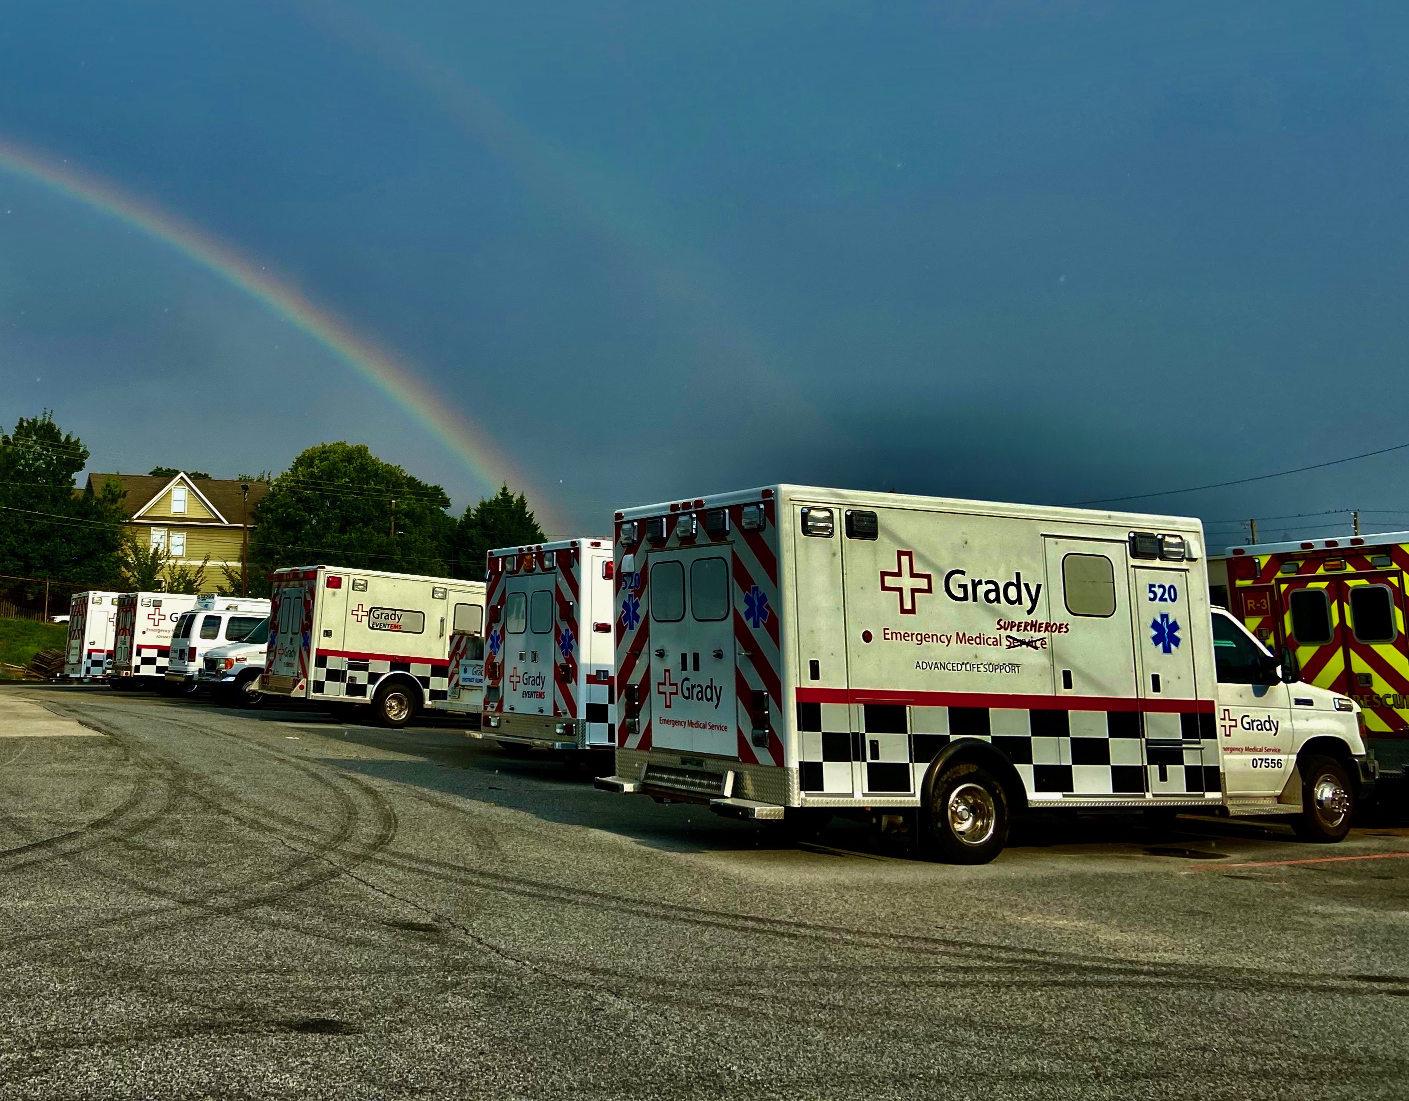 Grady EMS ambulances and a rainbow.